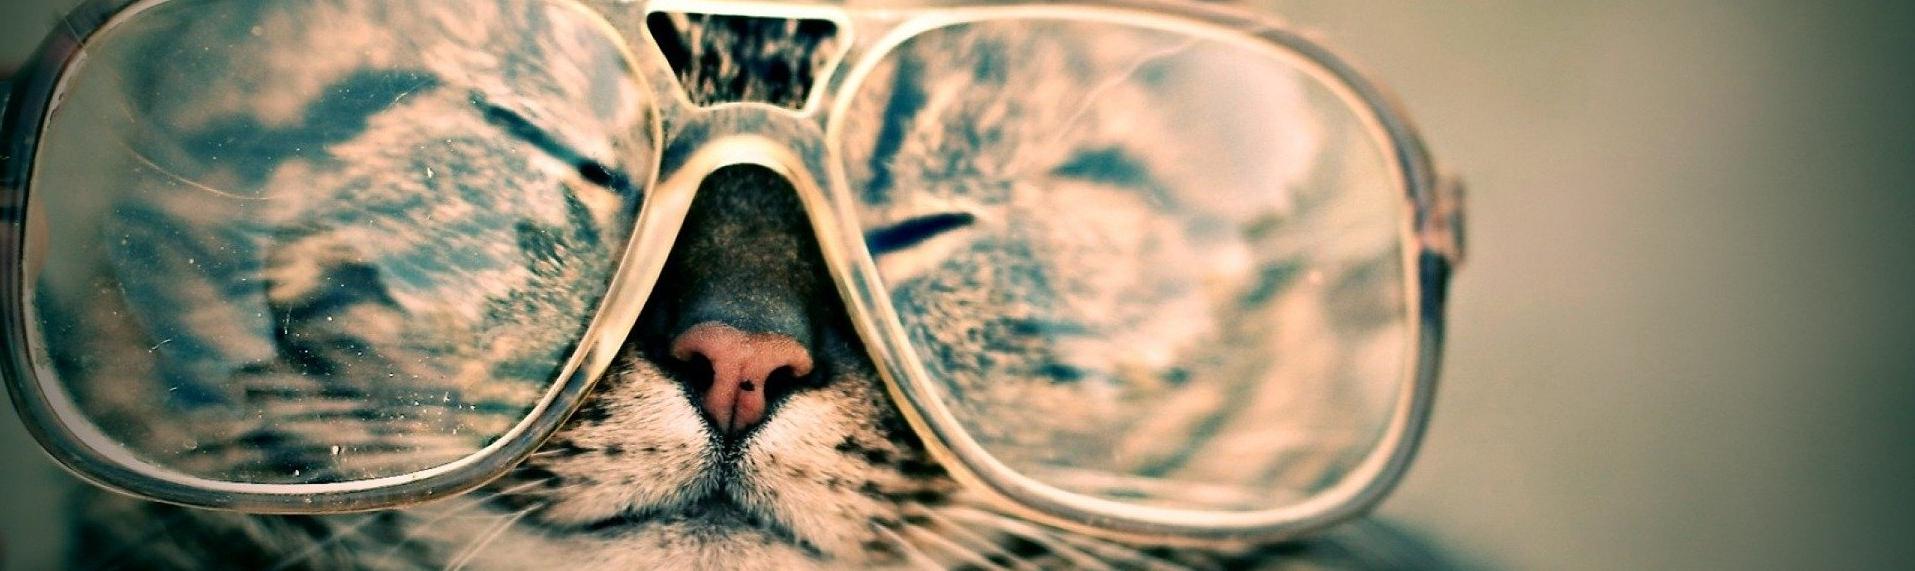 Das beste Katzenstreu - Katzenstreu unter der Lupe